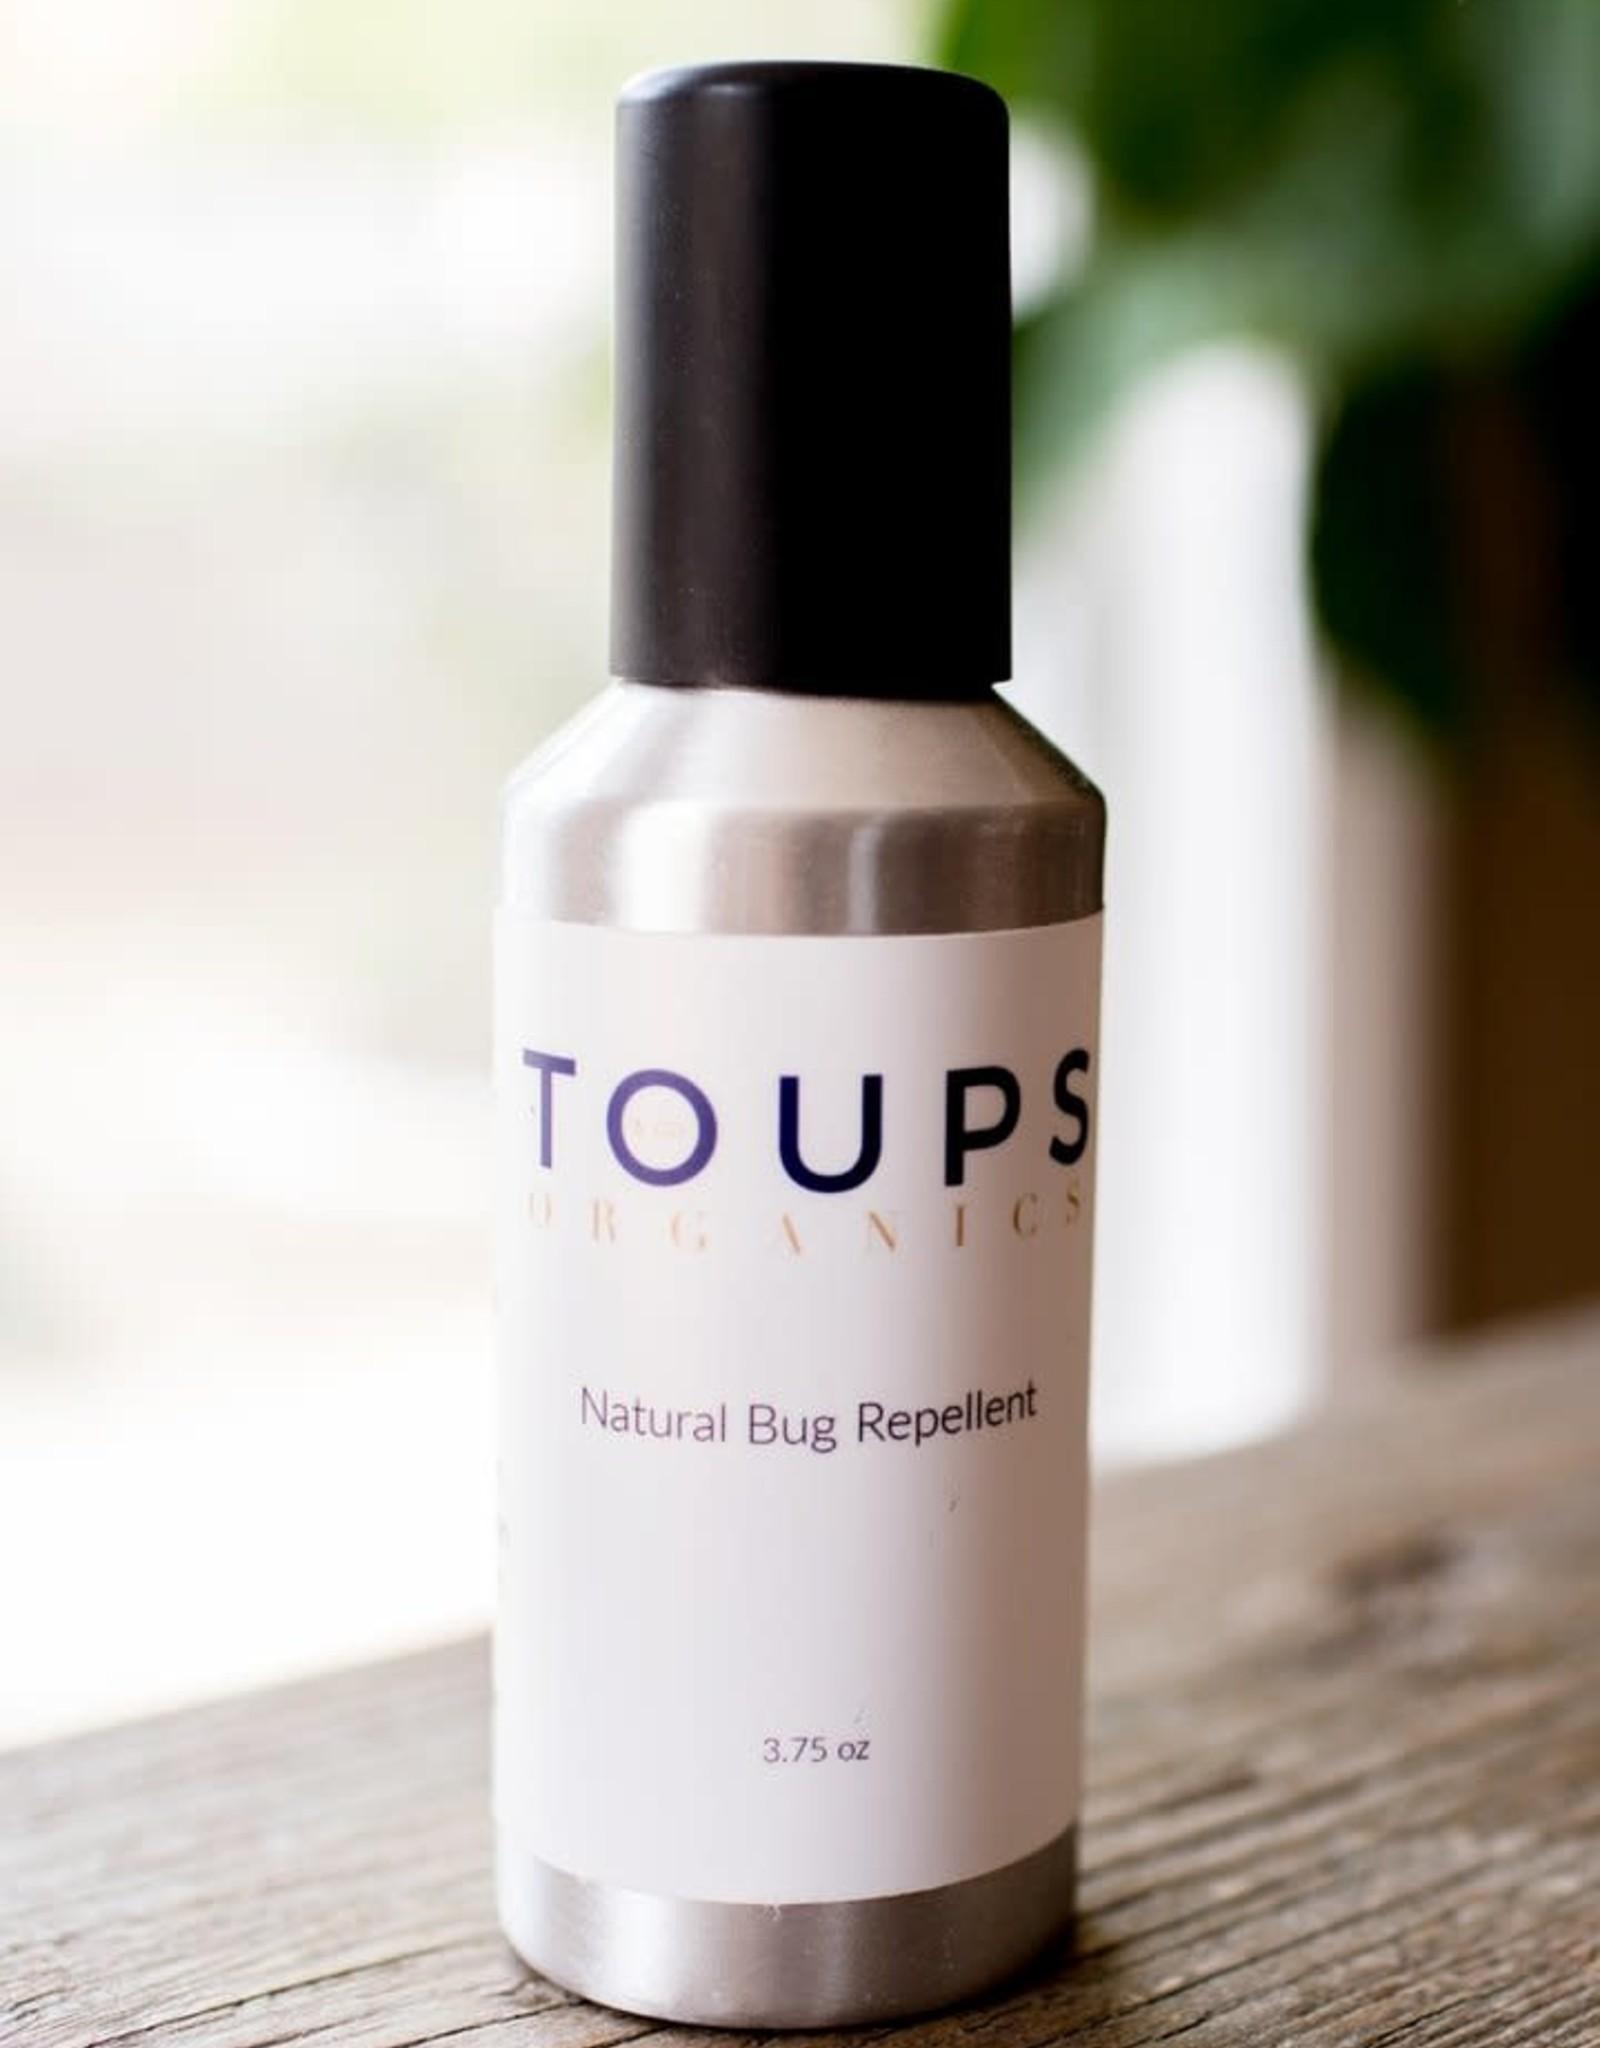 Toups Natural Bug Repellent